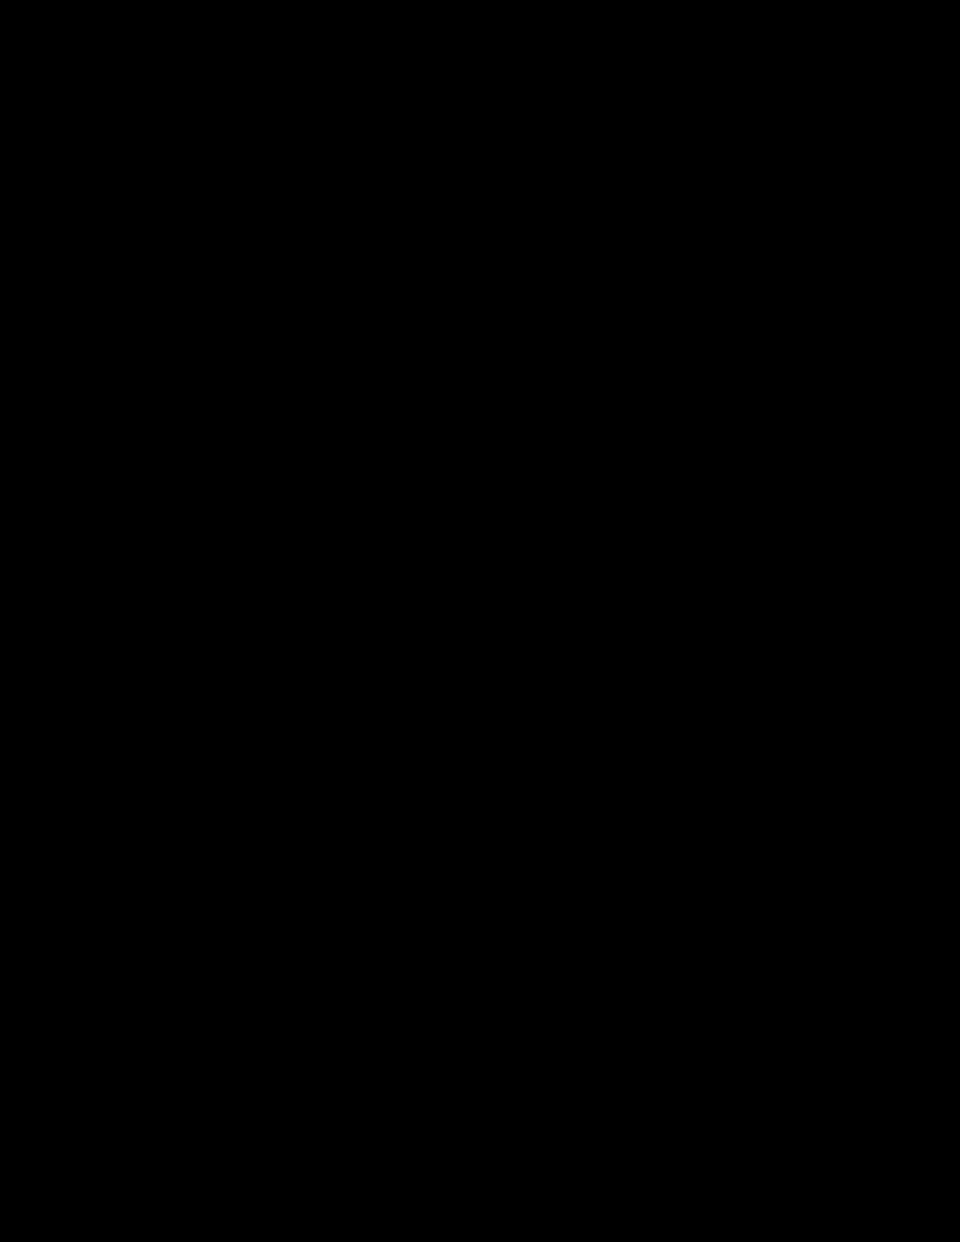 M-125-490 Brady 1H x 1-3//4W Black on White Self Laminating Polyester Cartridge Label